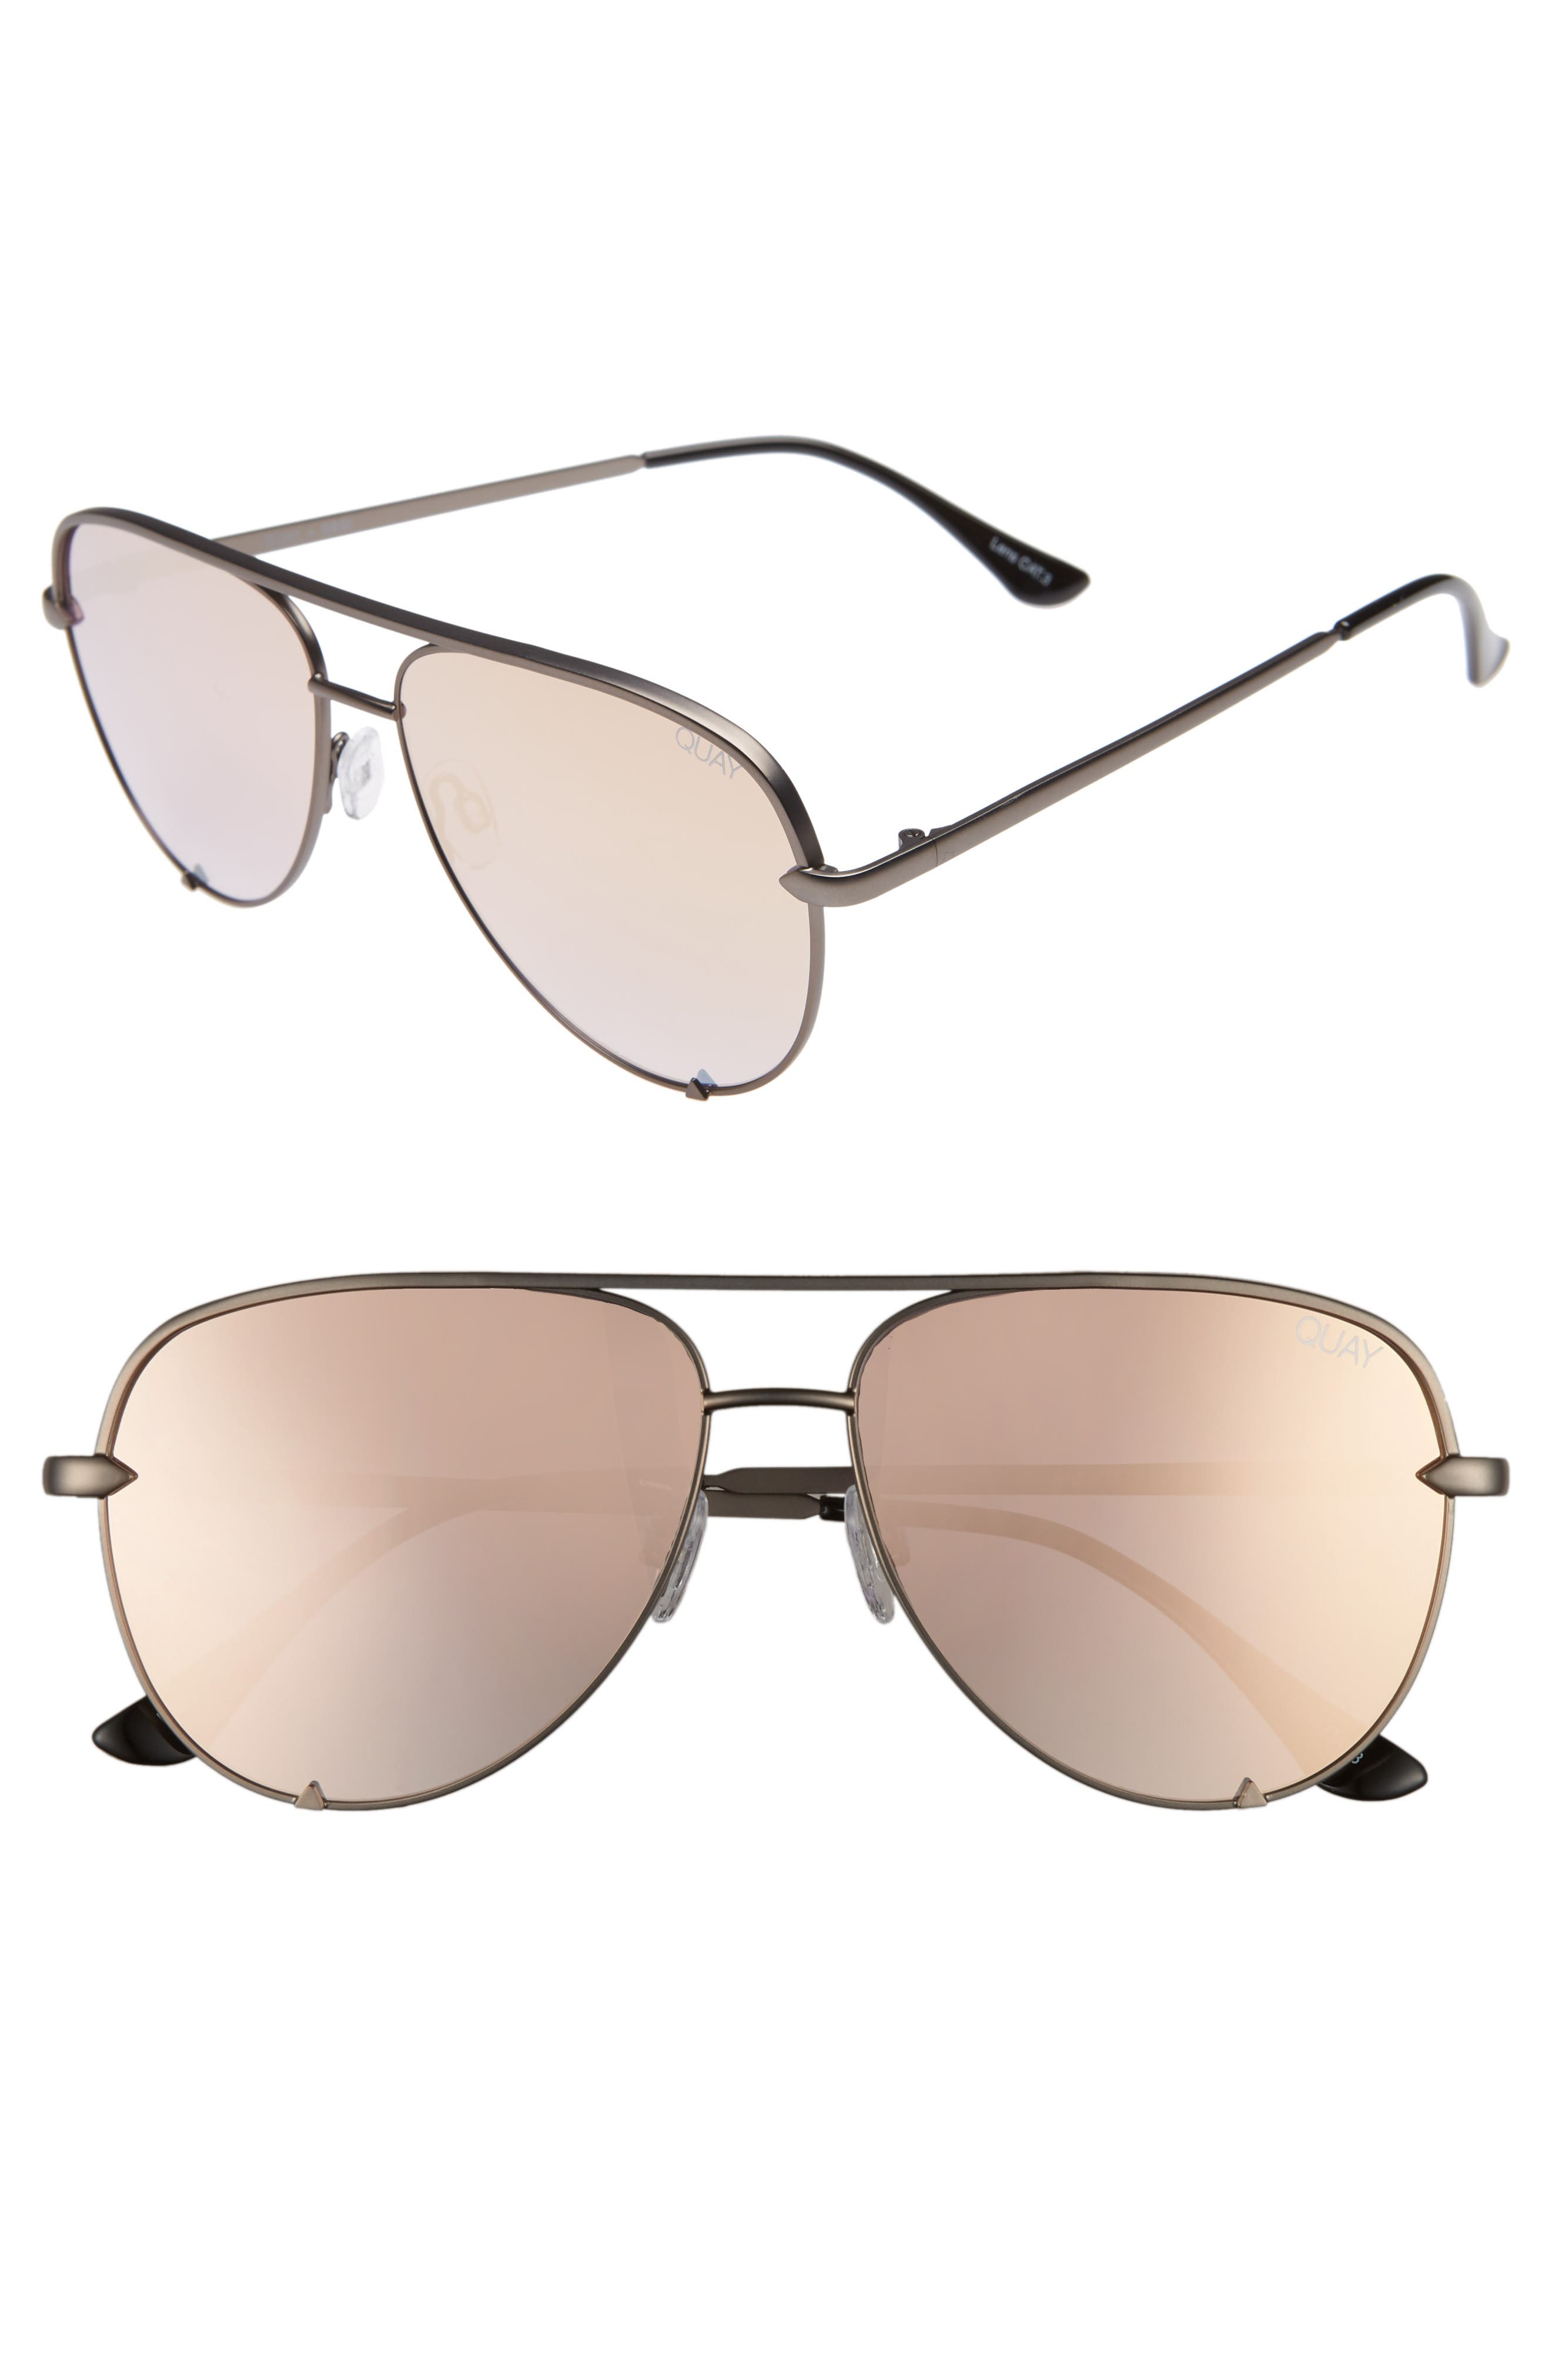 x Desi Perkins High Key Mini 57mm Aviator Sunglasses,                             Main thumbnail 1, color,                             GUNMETAL/ ROSE